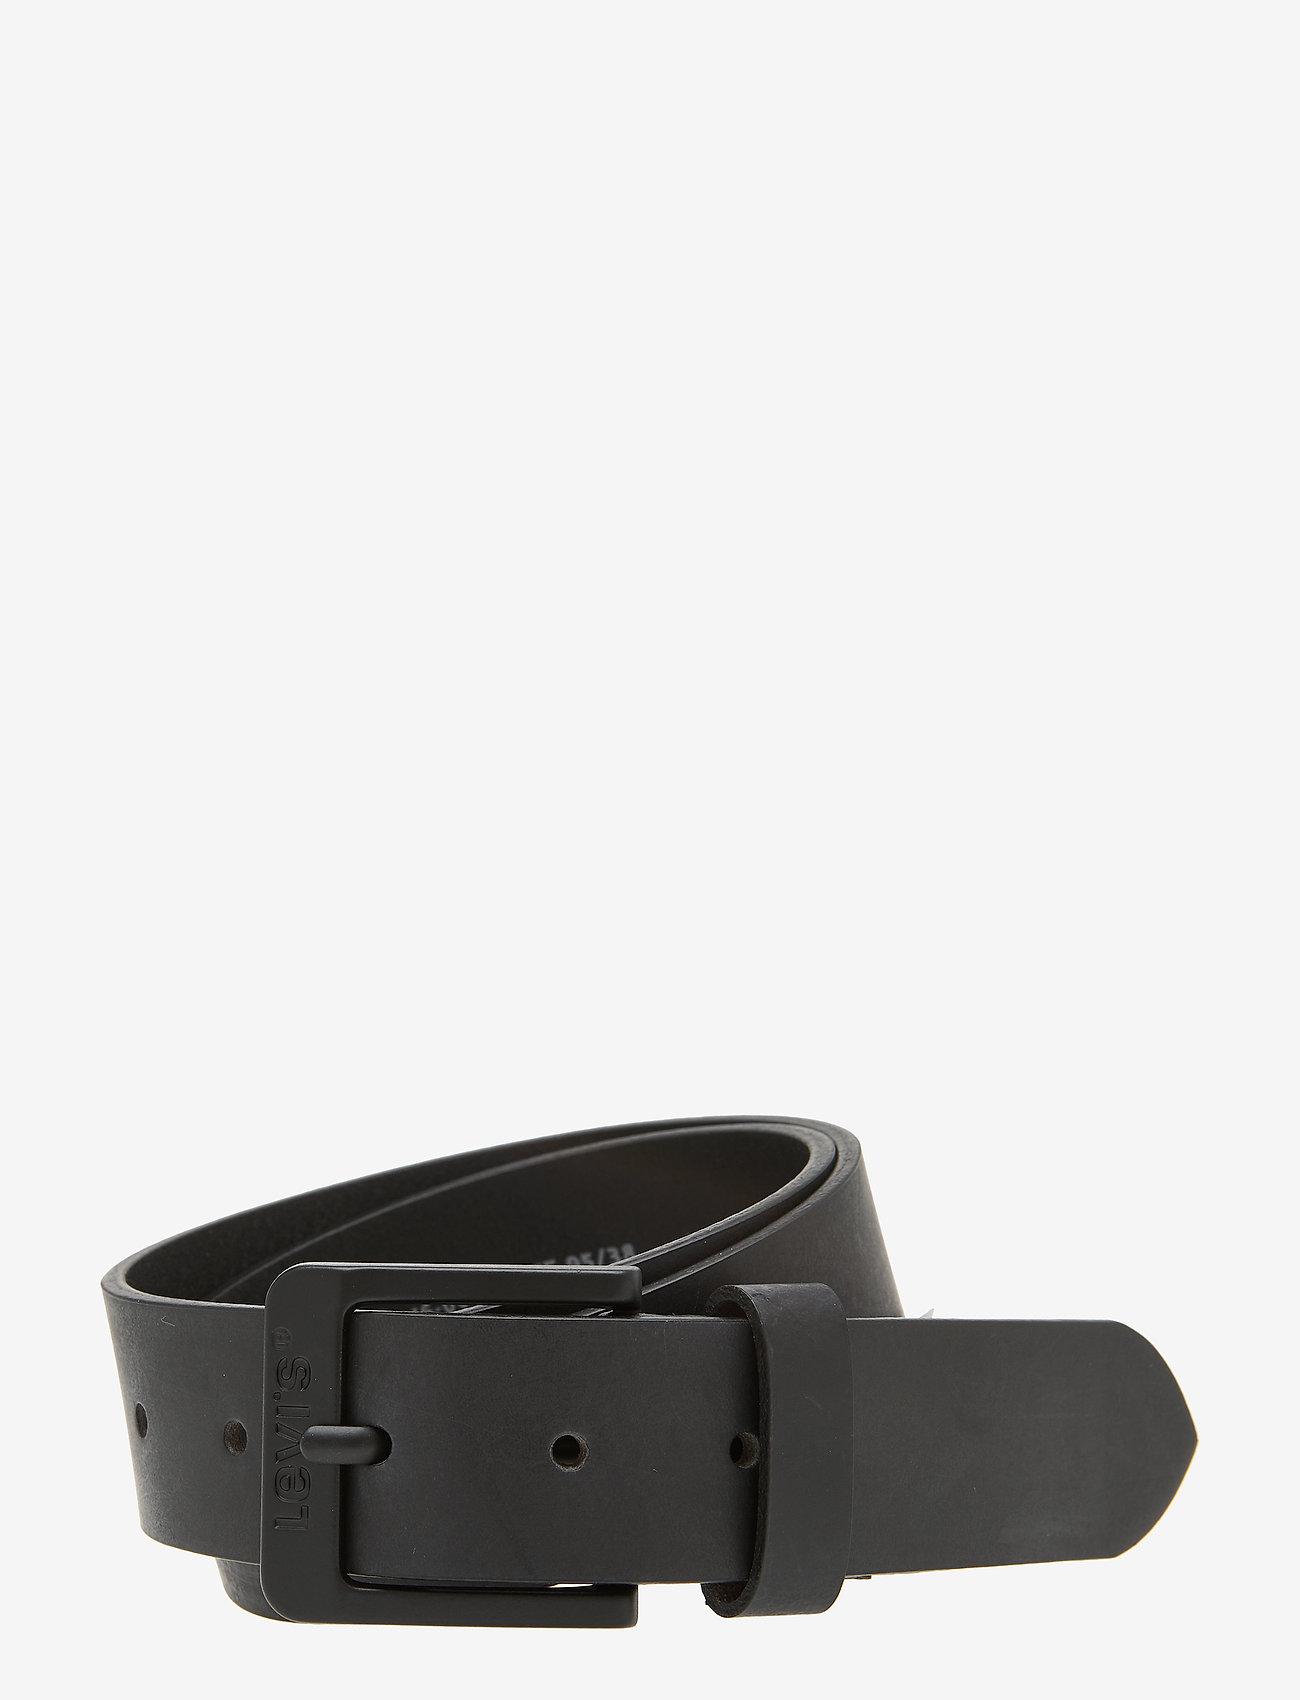 Levi's Footwear & Acc - FREE METAL - bælter - regular black - 0